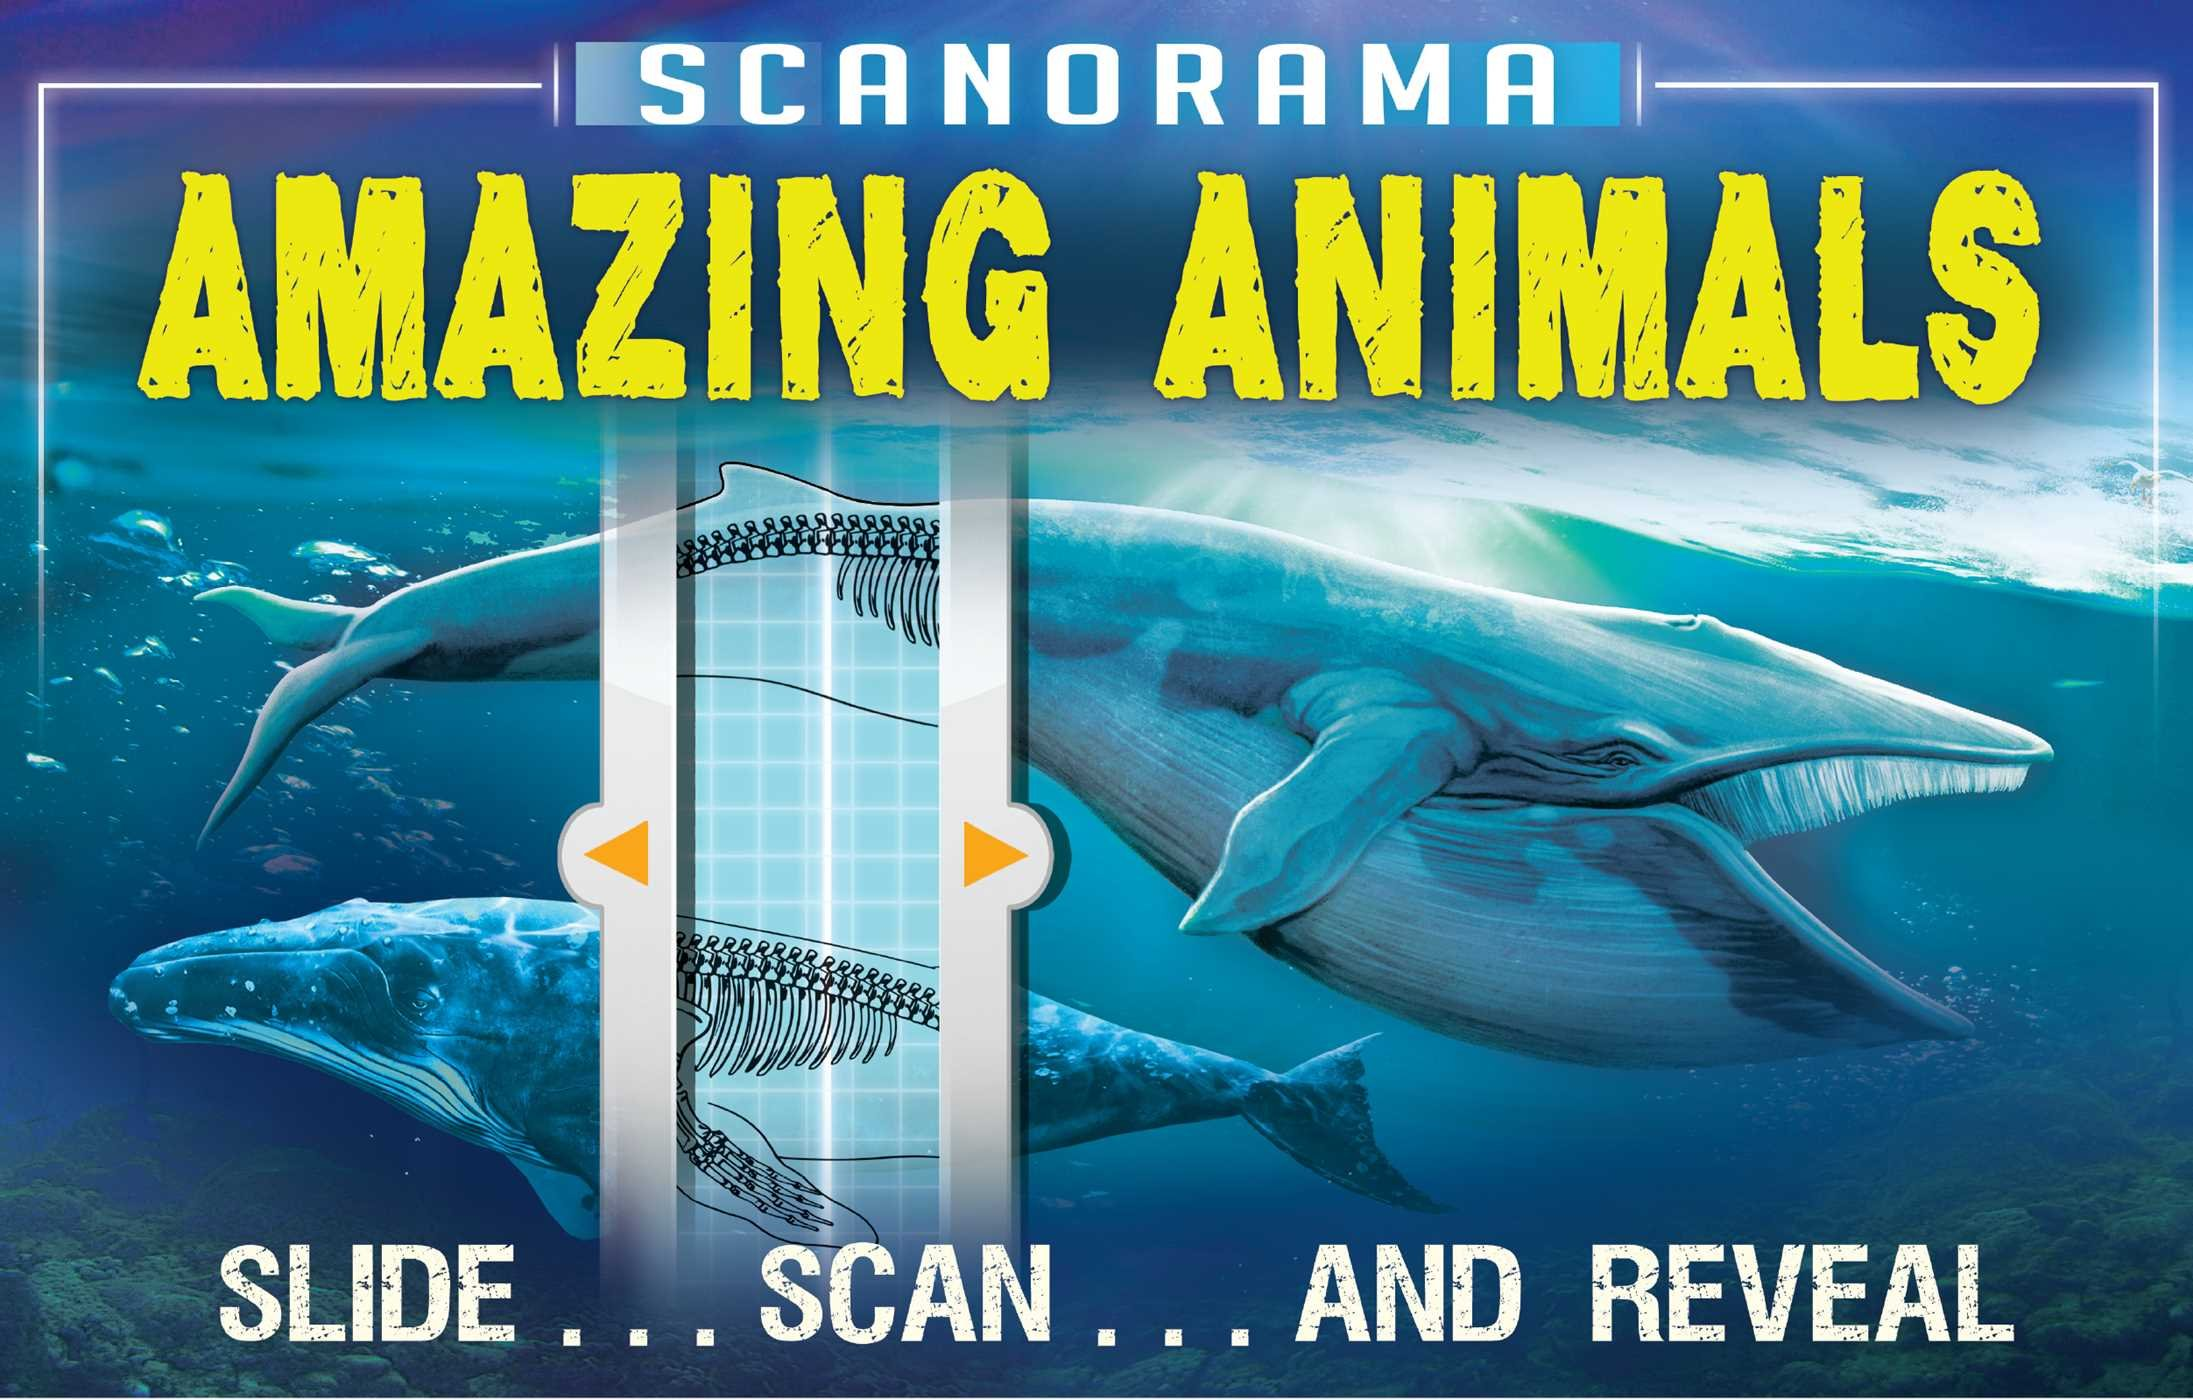 Scanorama: Amazing Animals